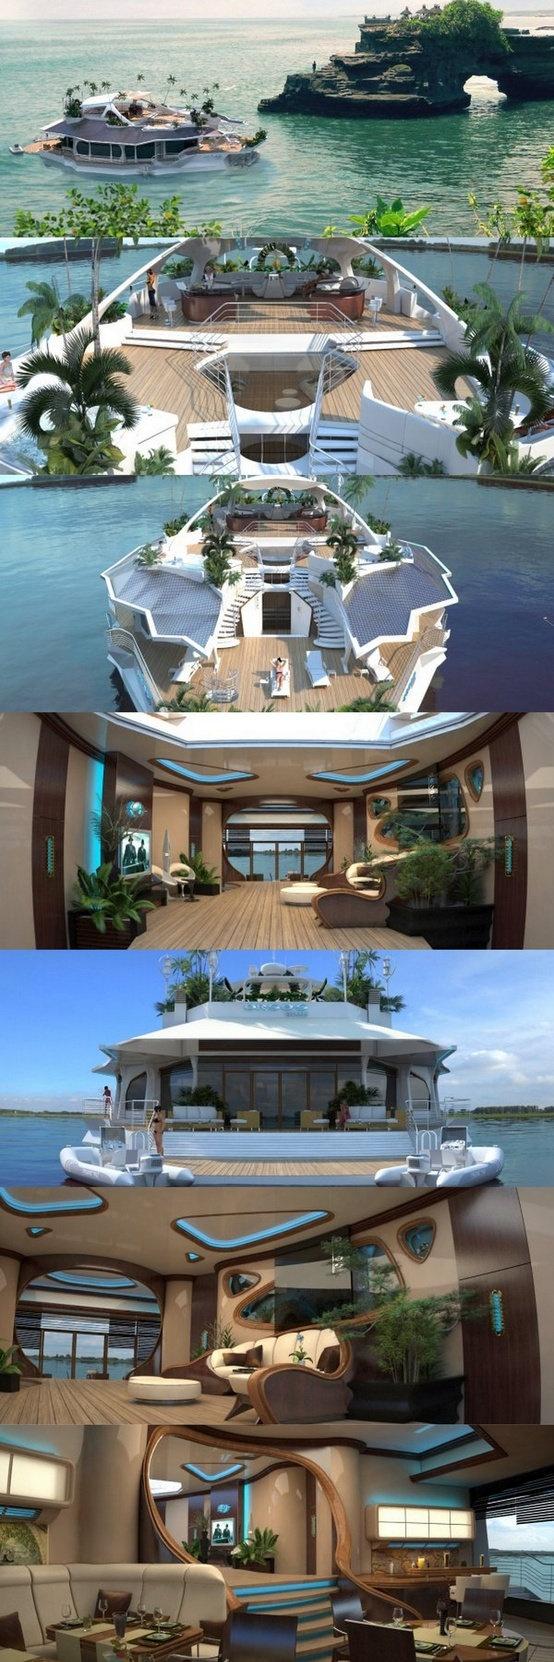 ORSOS Island – $4700000 million artificial island